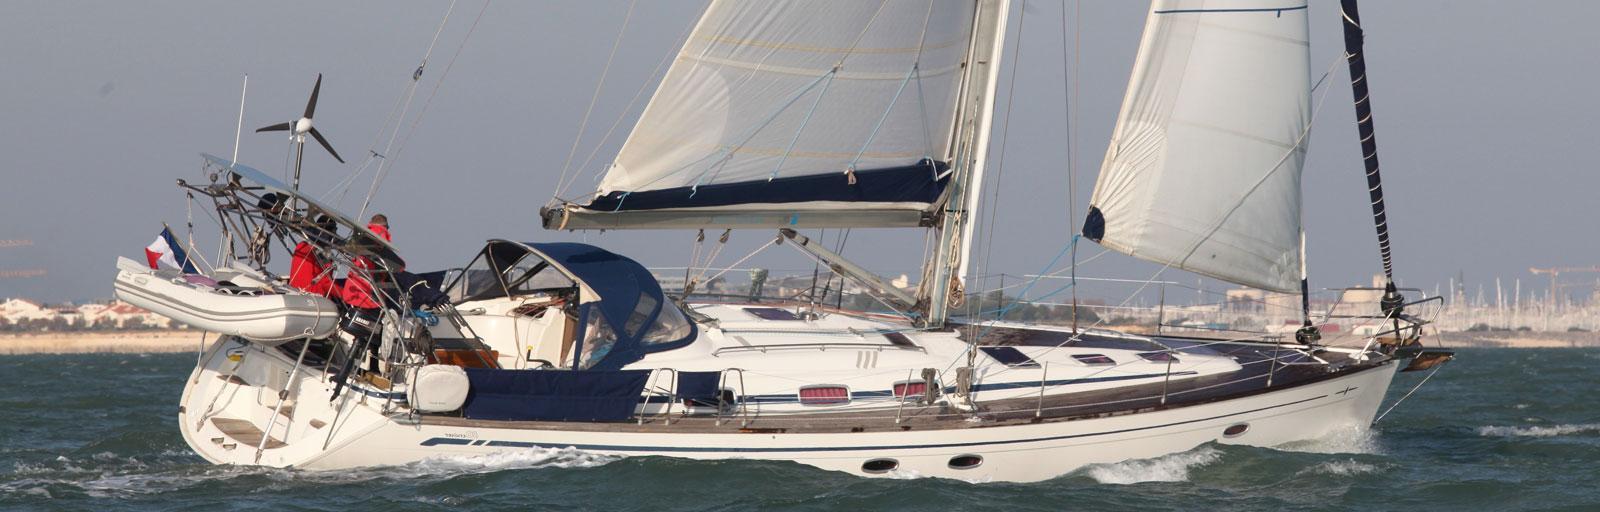 Bavaria 50 - AYC Yachtbroker